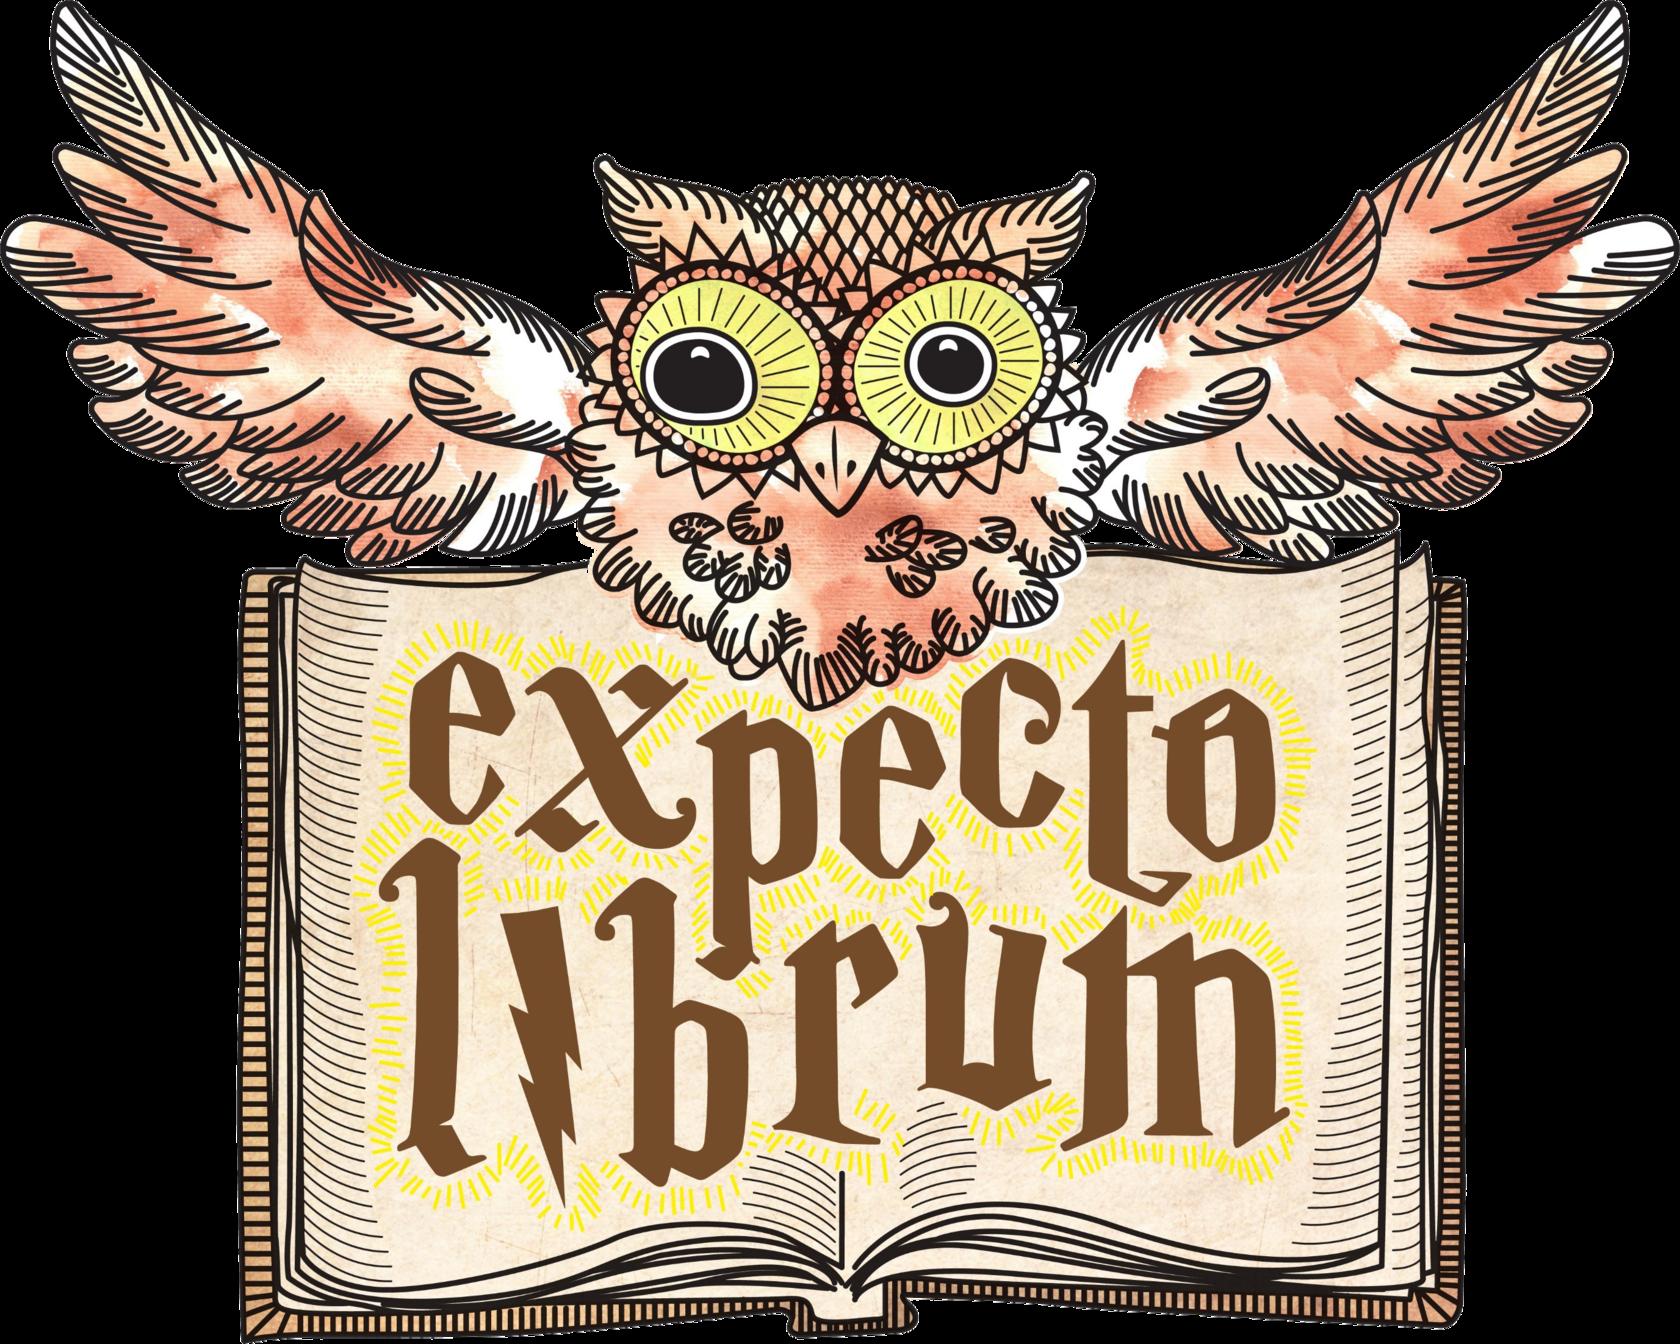 Expecto Librum